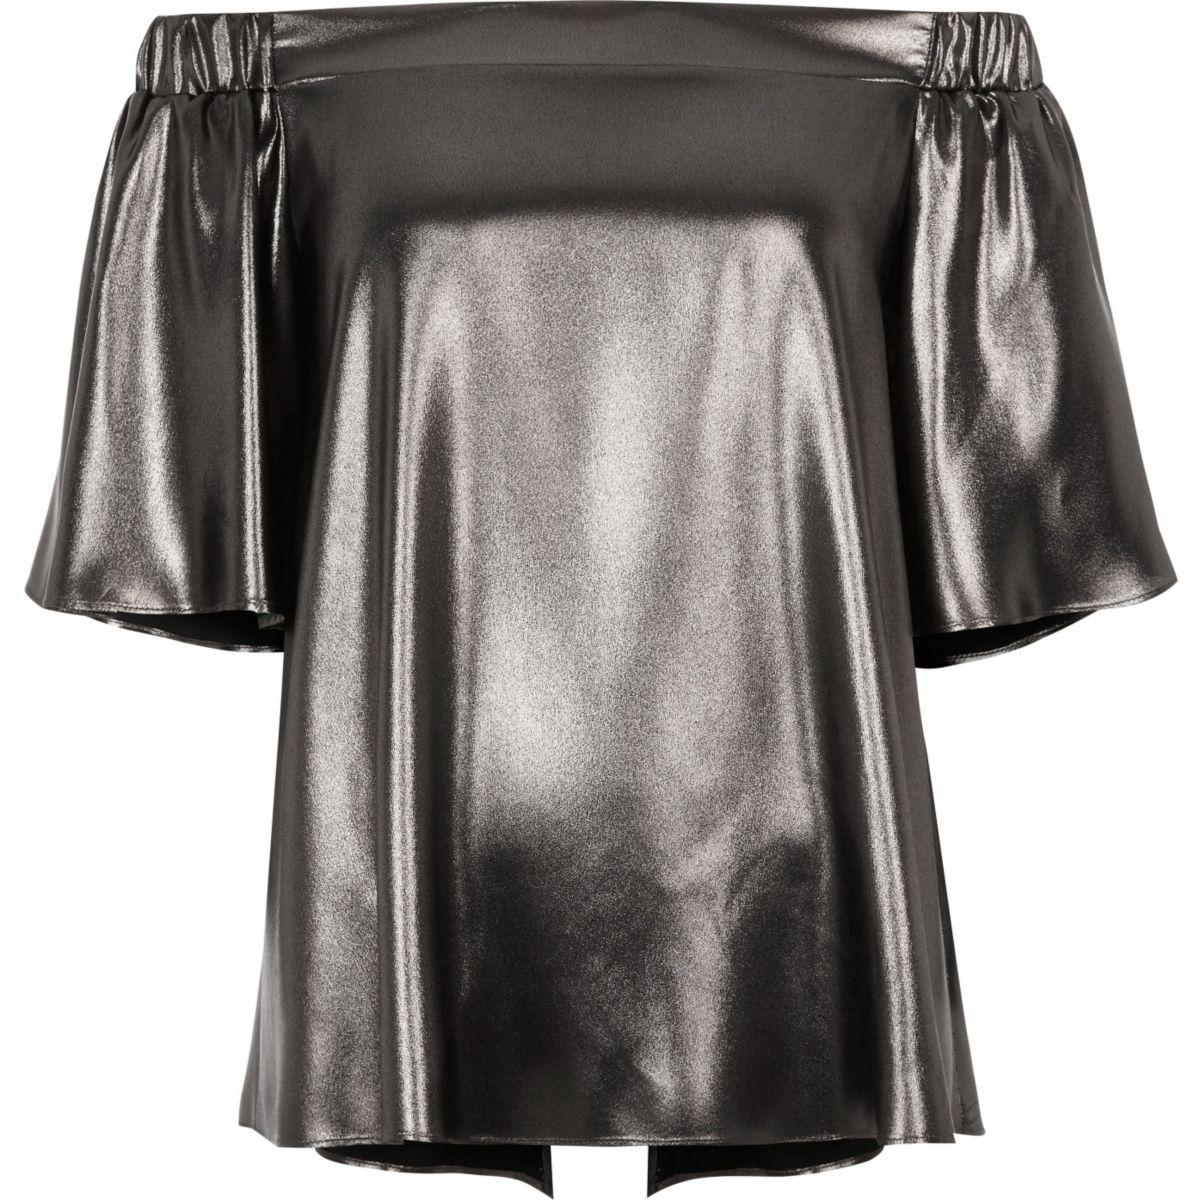 Silver metallic bardot top